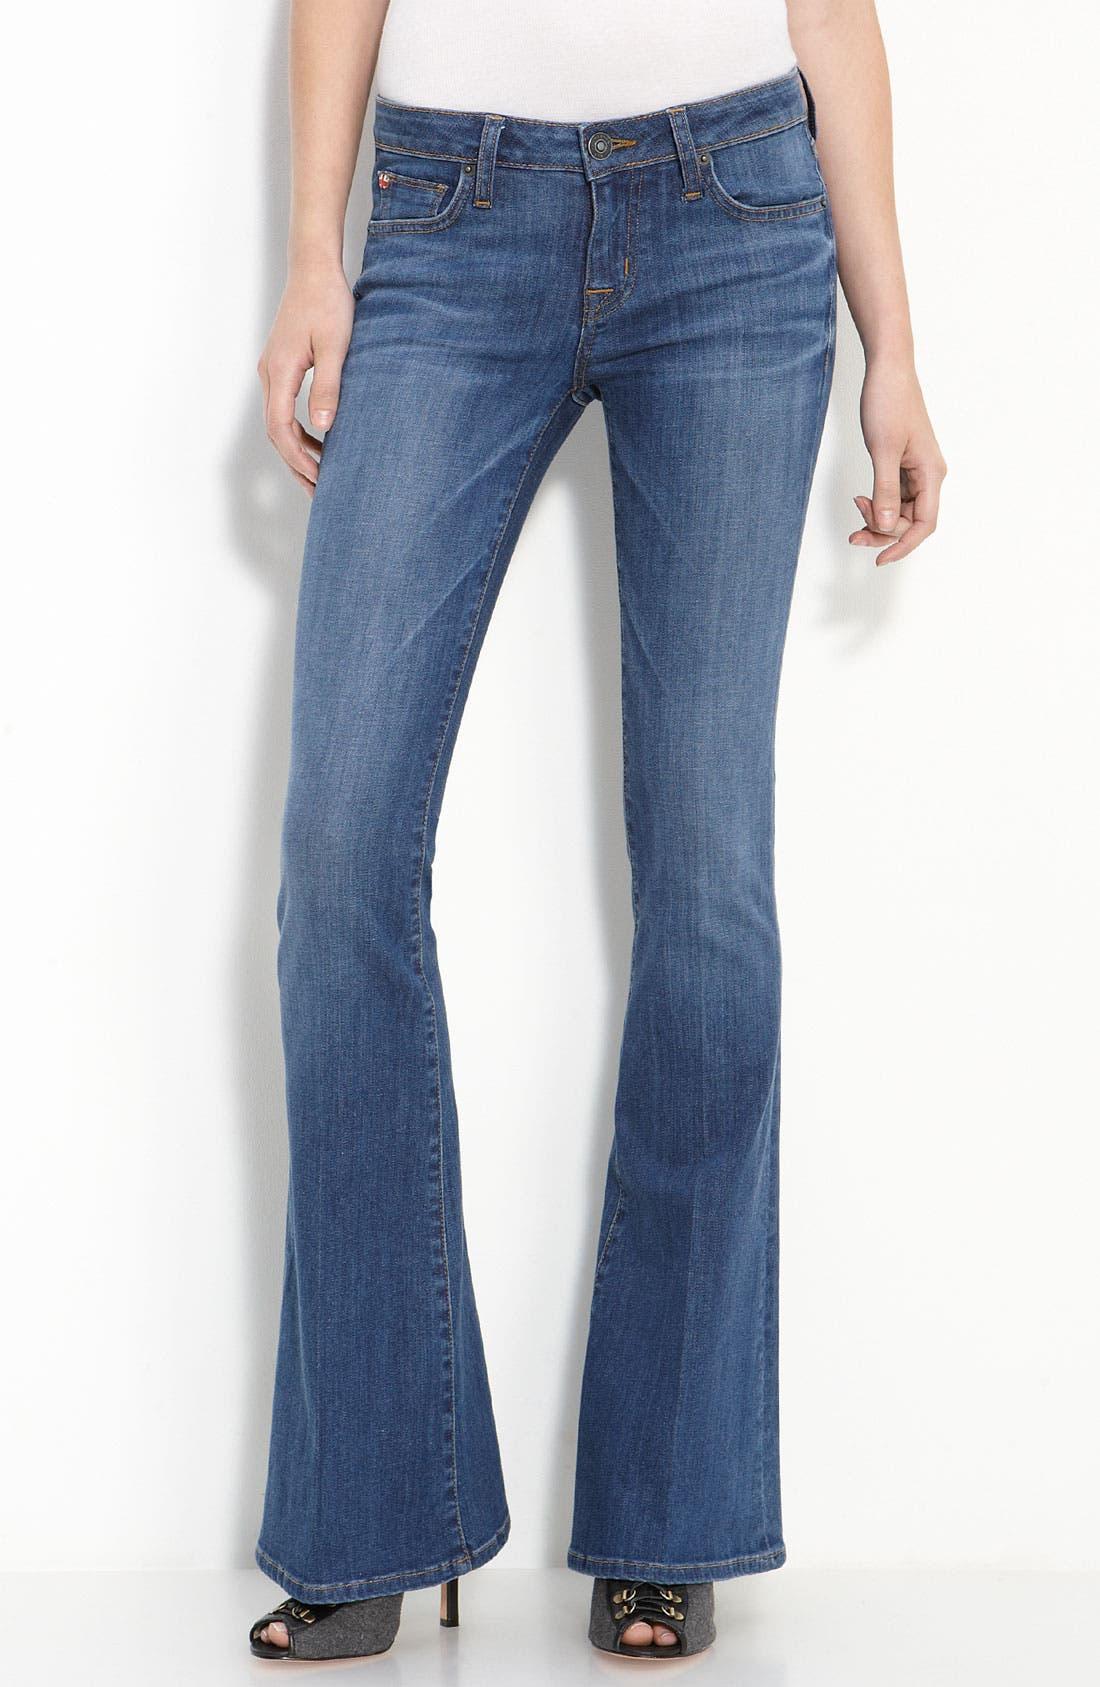 HUDSON JEANS,                             'Ferris' Flare Leg Stretch Denim Jeans,                             Main thumbnail 1, color,                             401